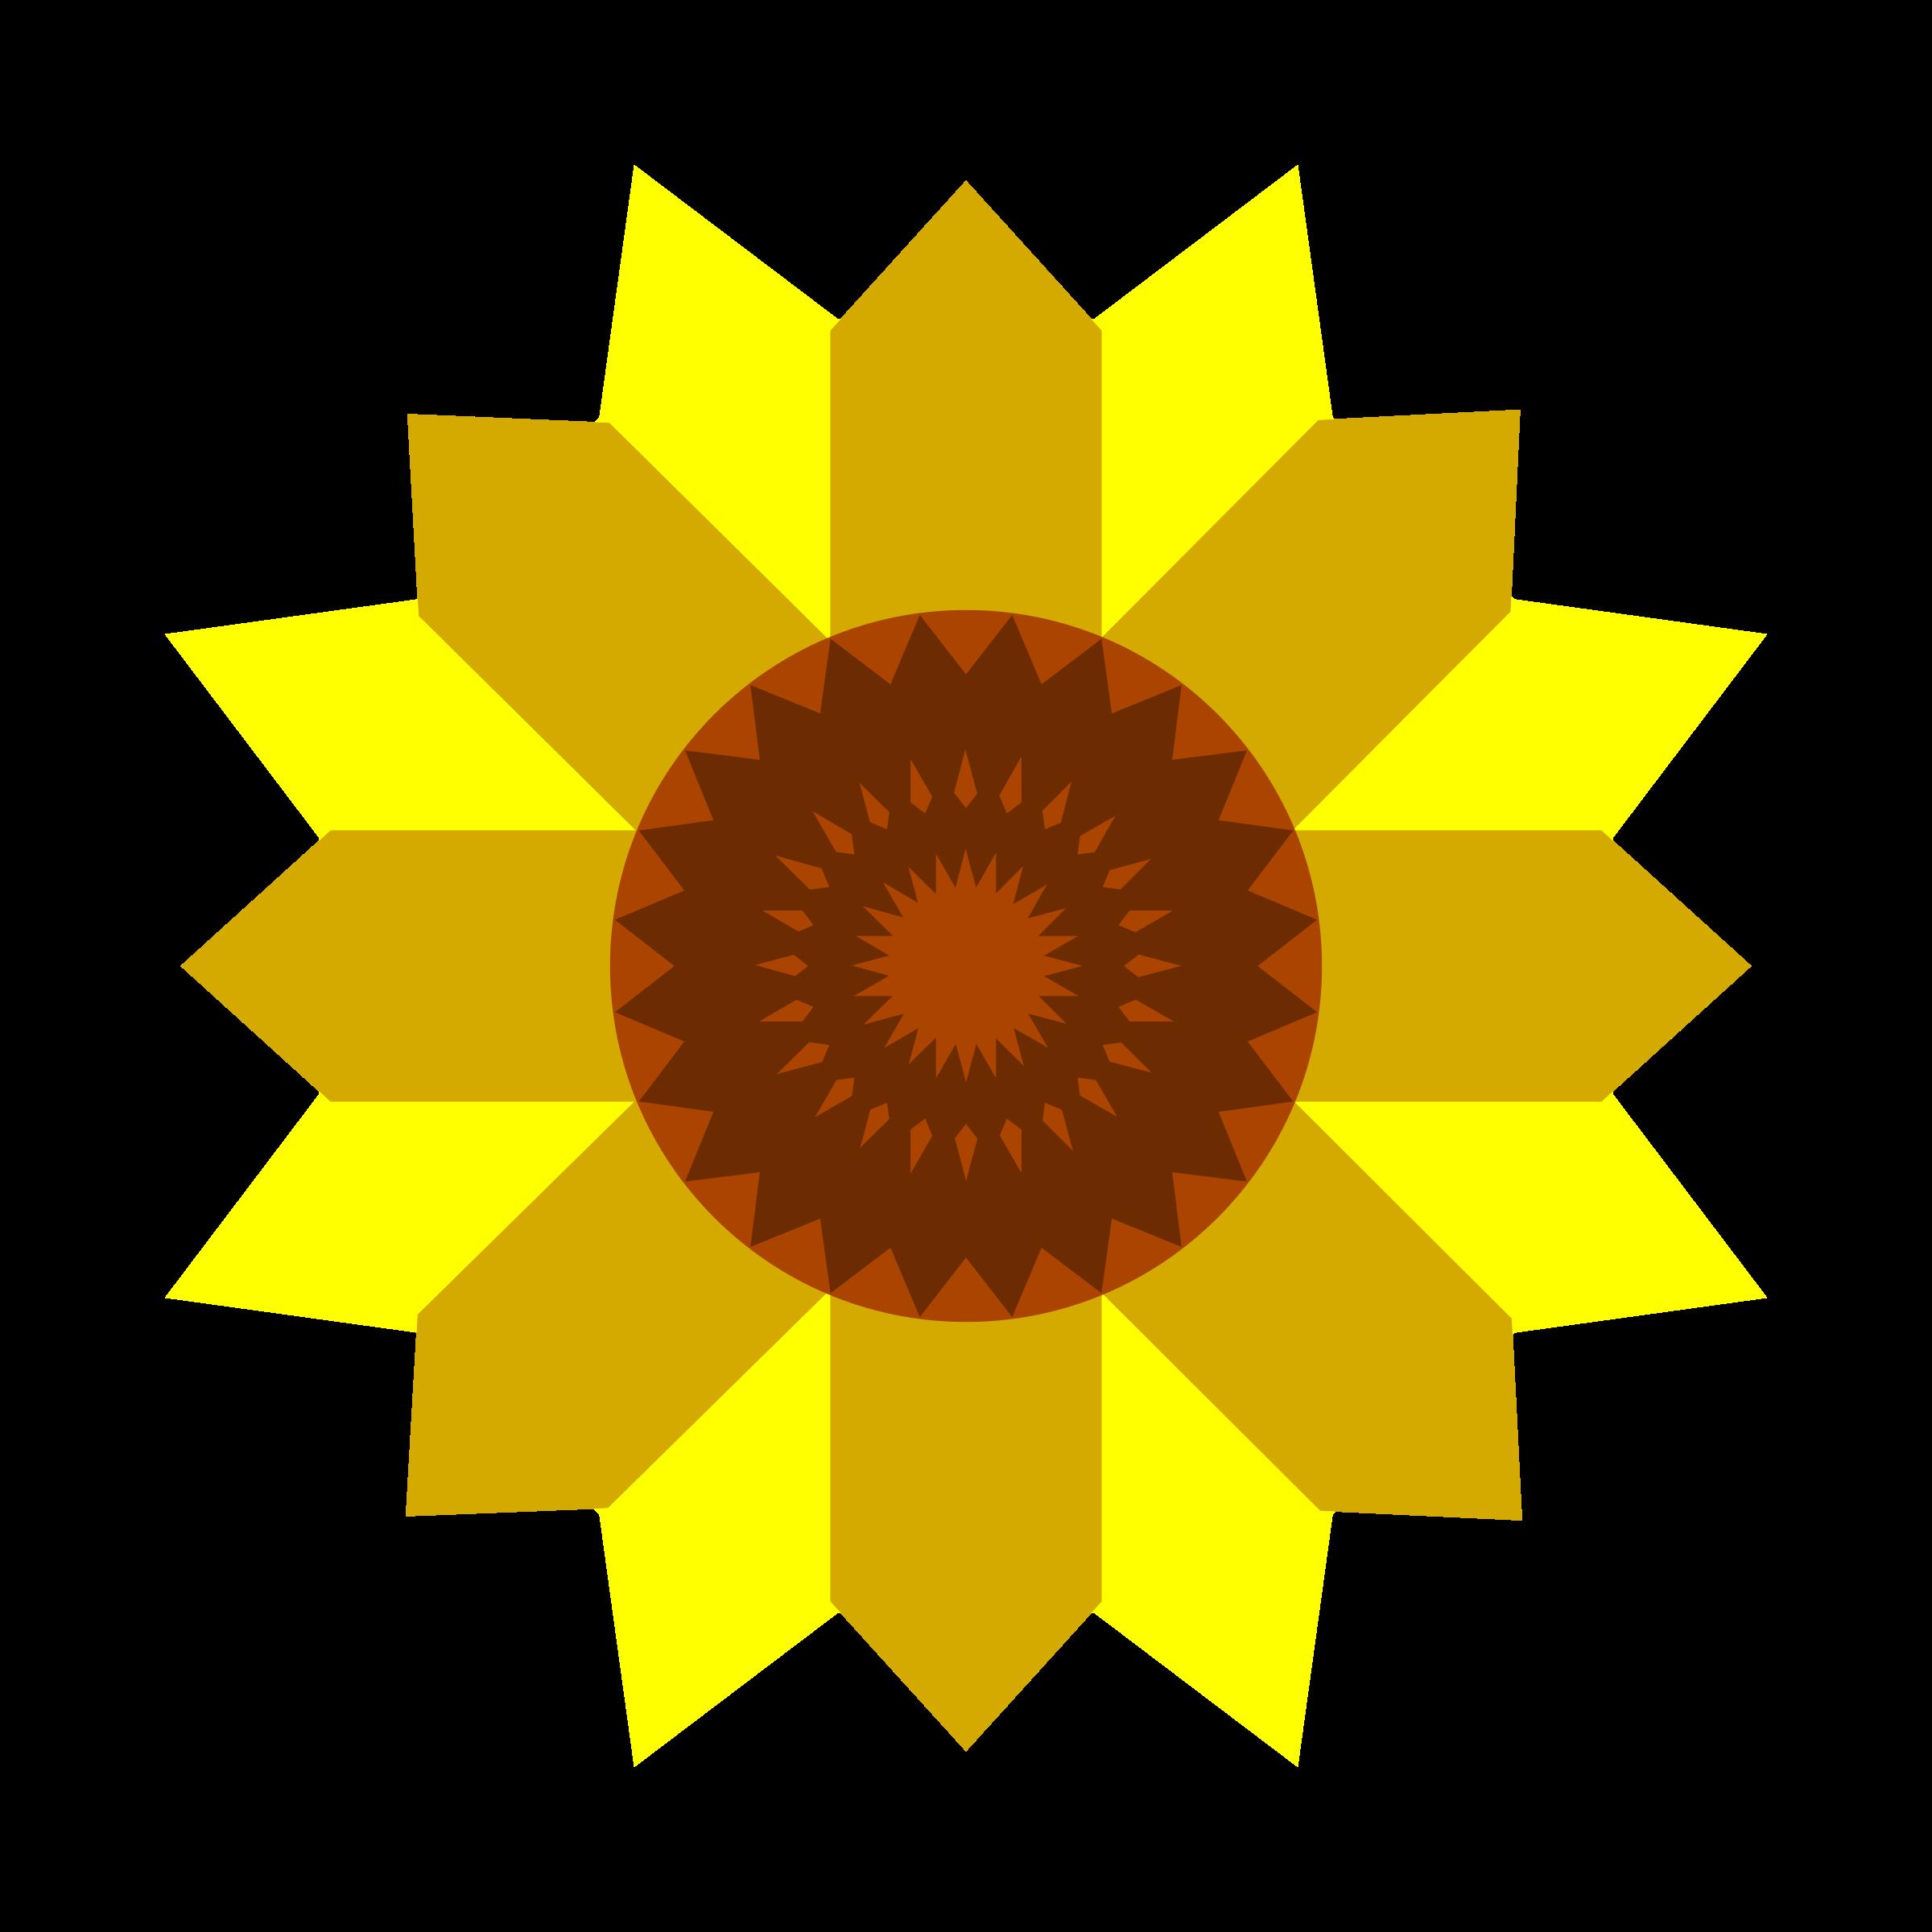 . Garden clipart sunflower